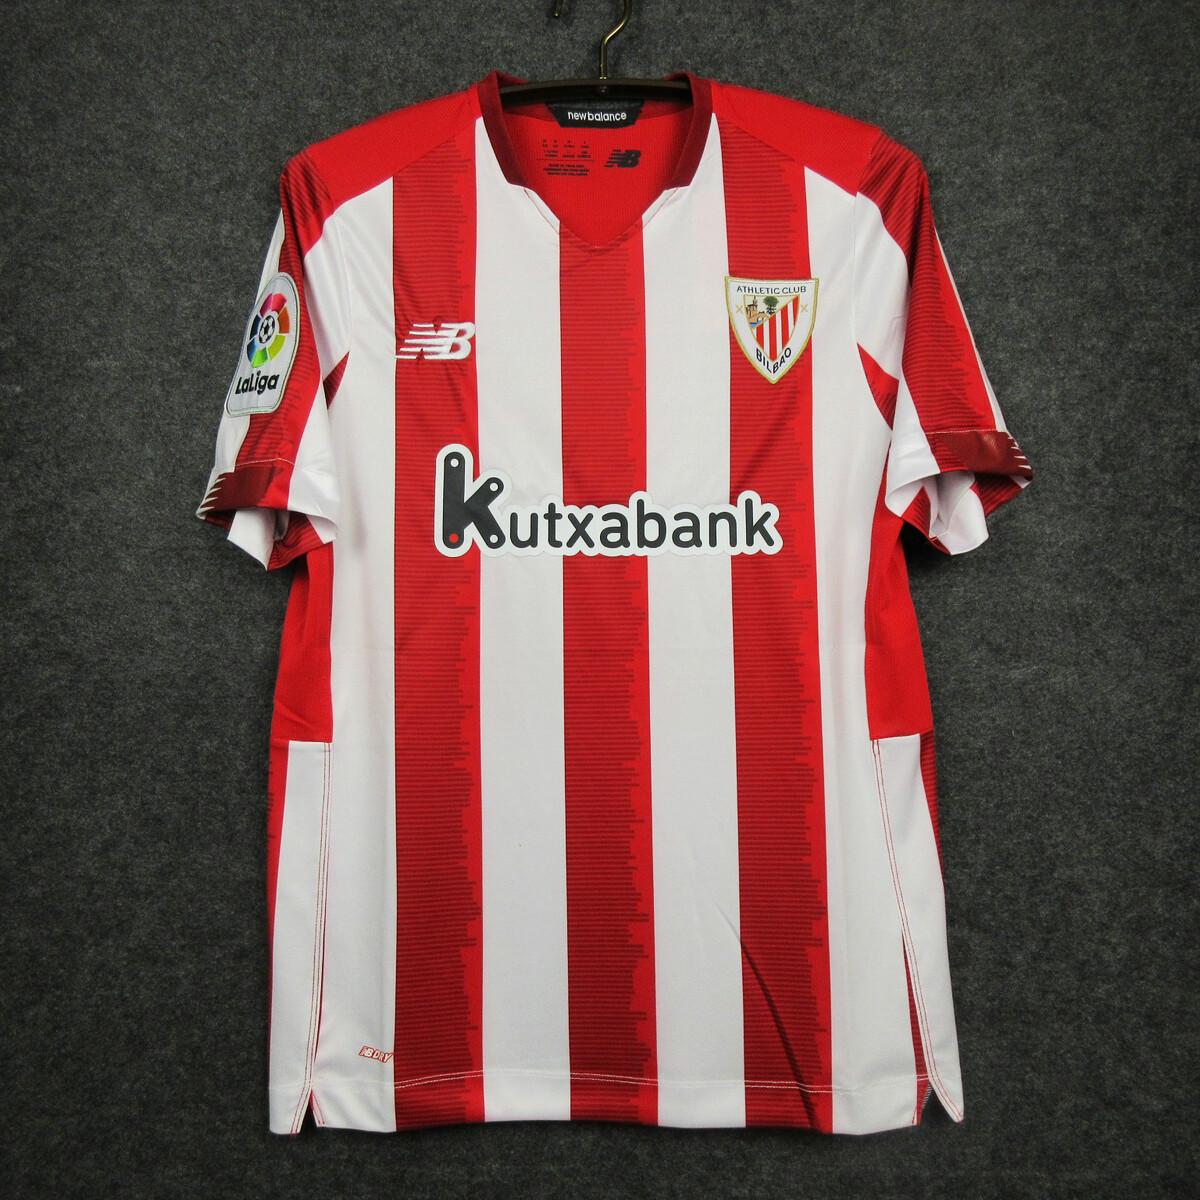 Camisa Athletic Bilbao 2020-2021 New Balance Uniforme Titular